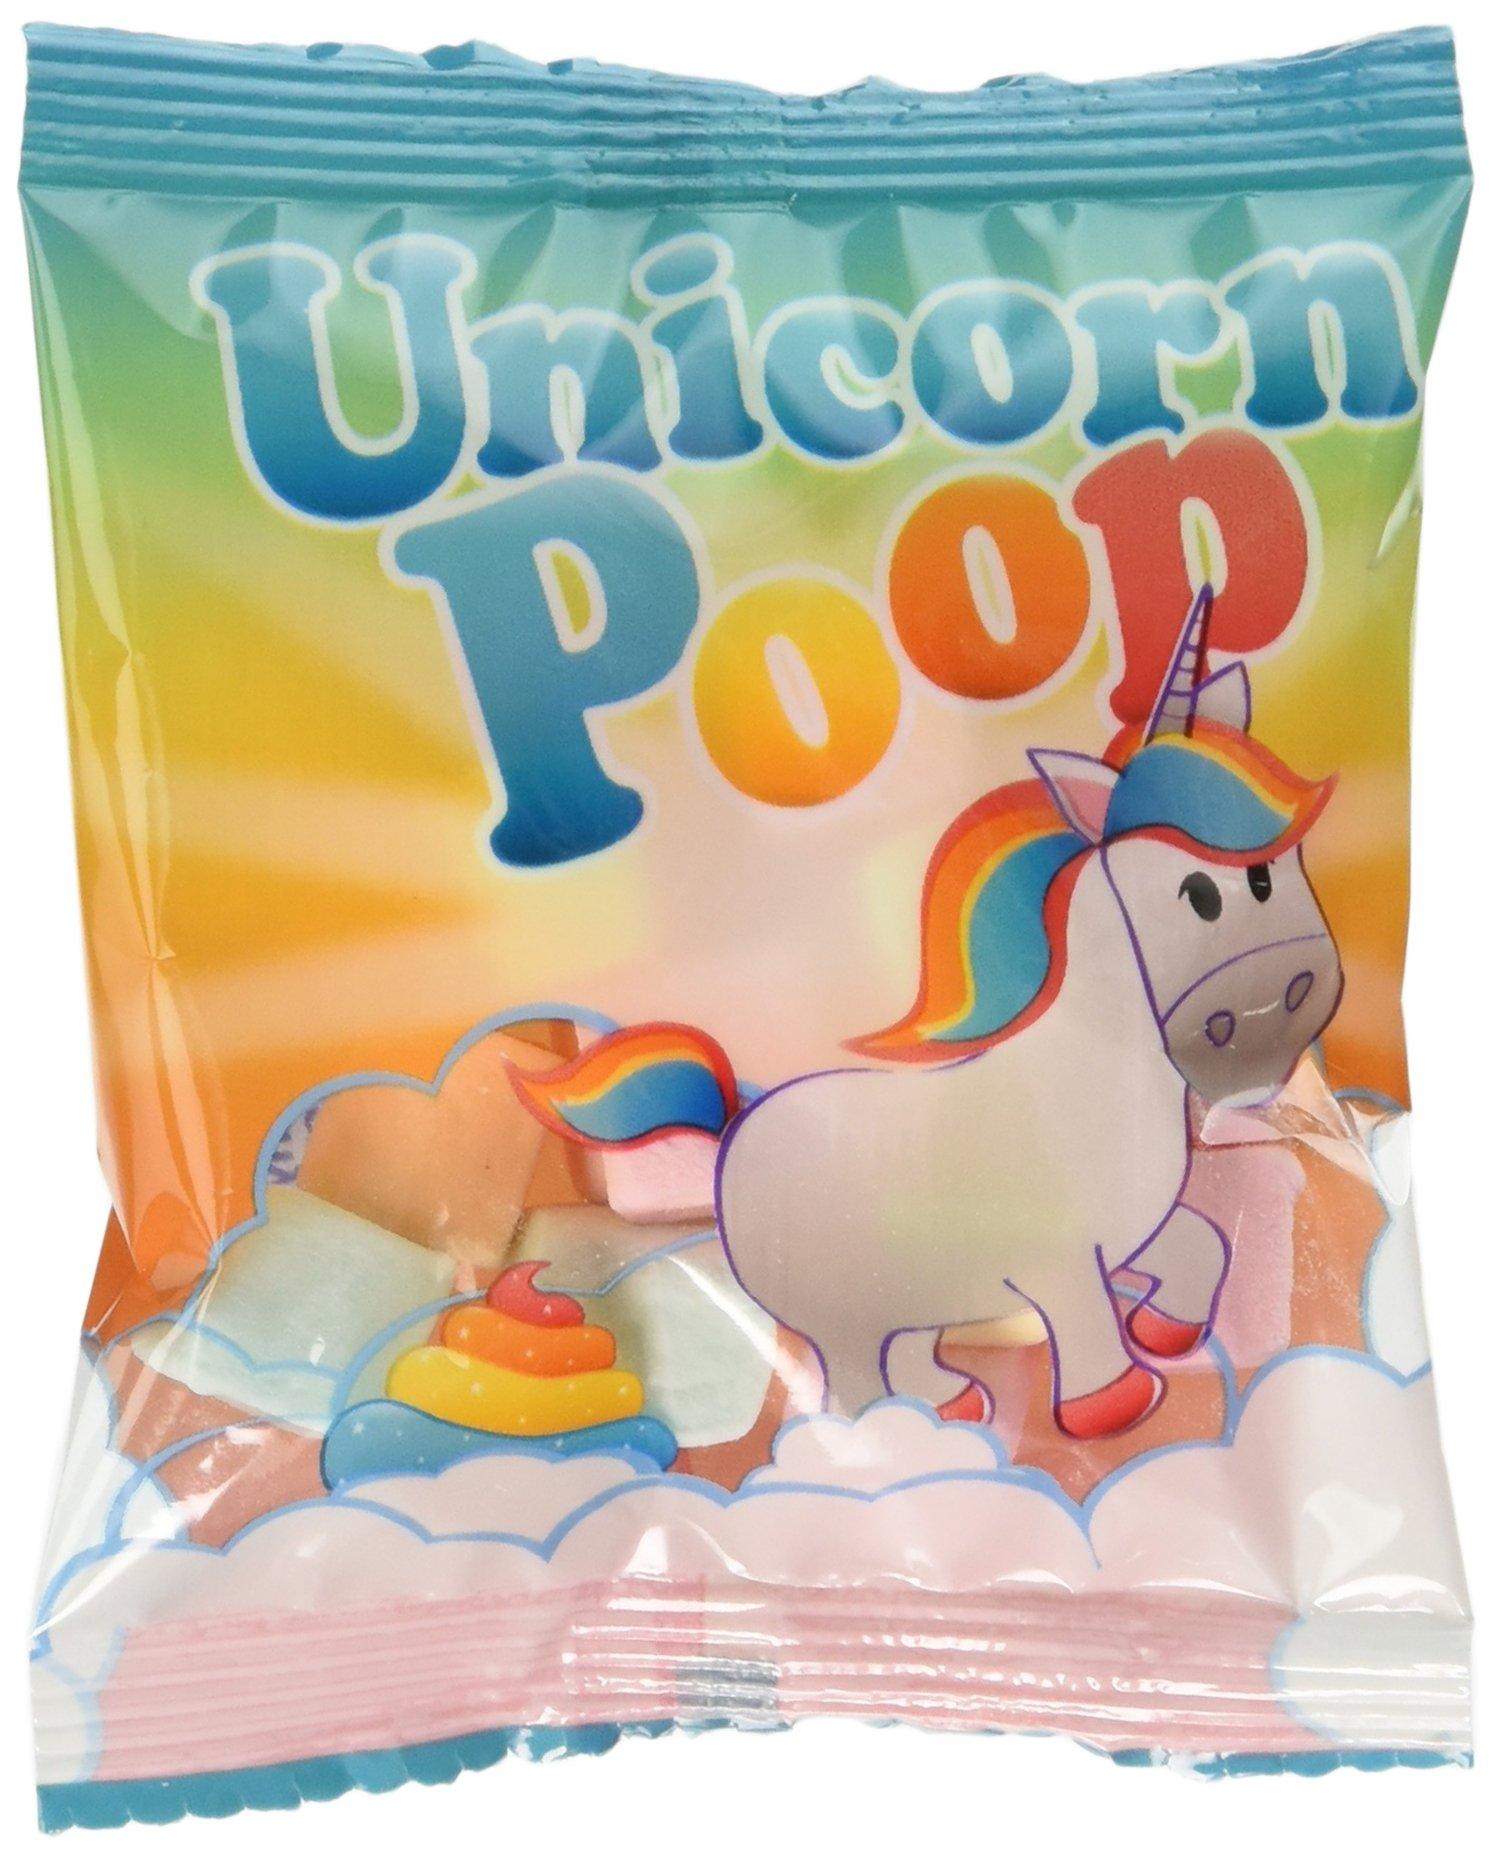 Unicorn Poop Marshmallow Candy Fun Packs - 57 Packs by Fun Express